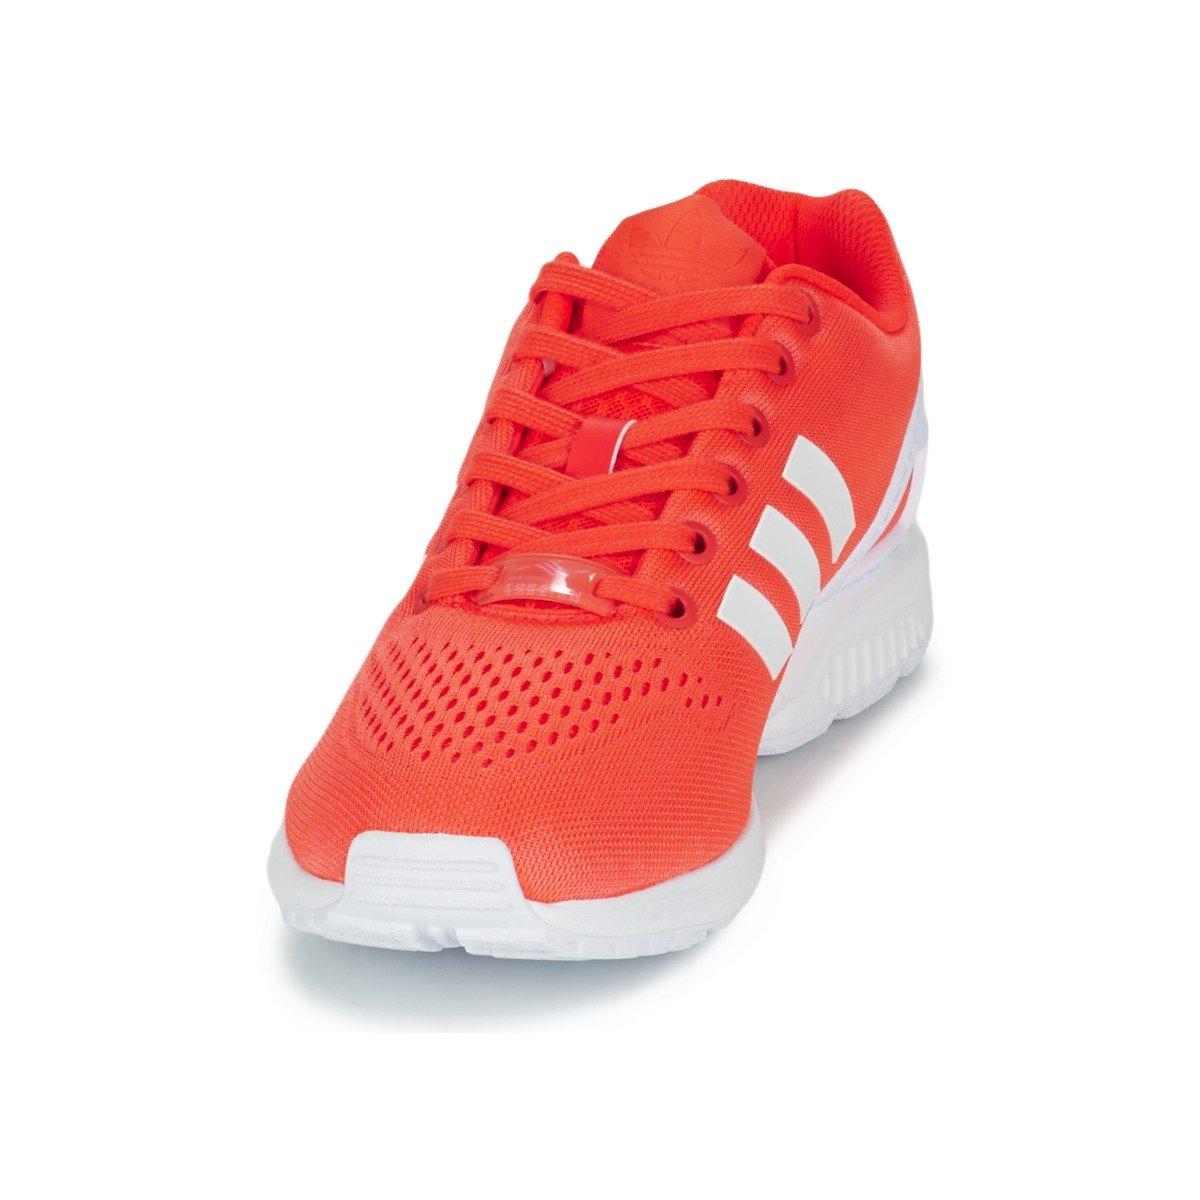 Schuhe Zx Flux Flux Flux Em Orange Weiß W 6cbbe0